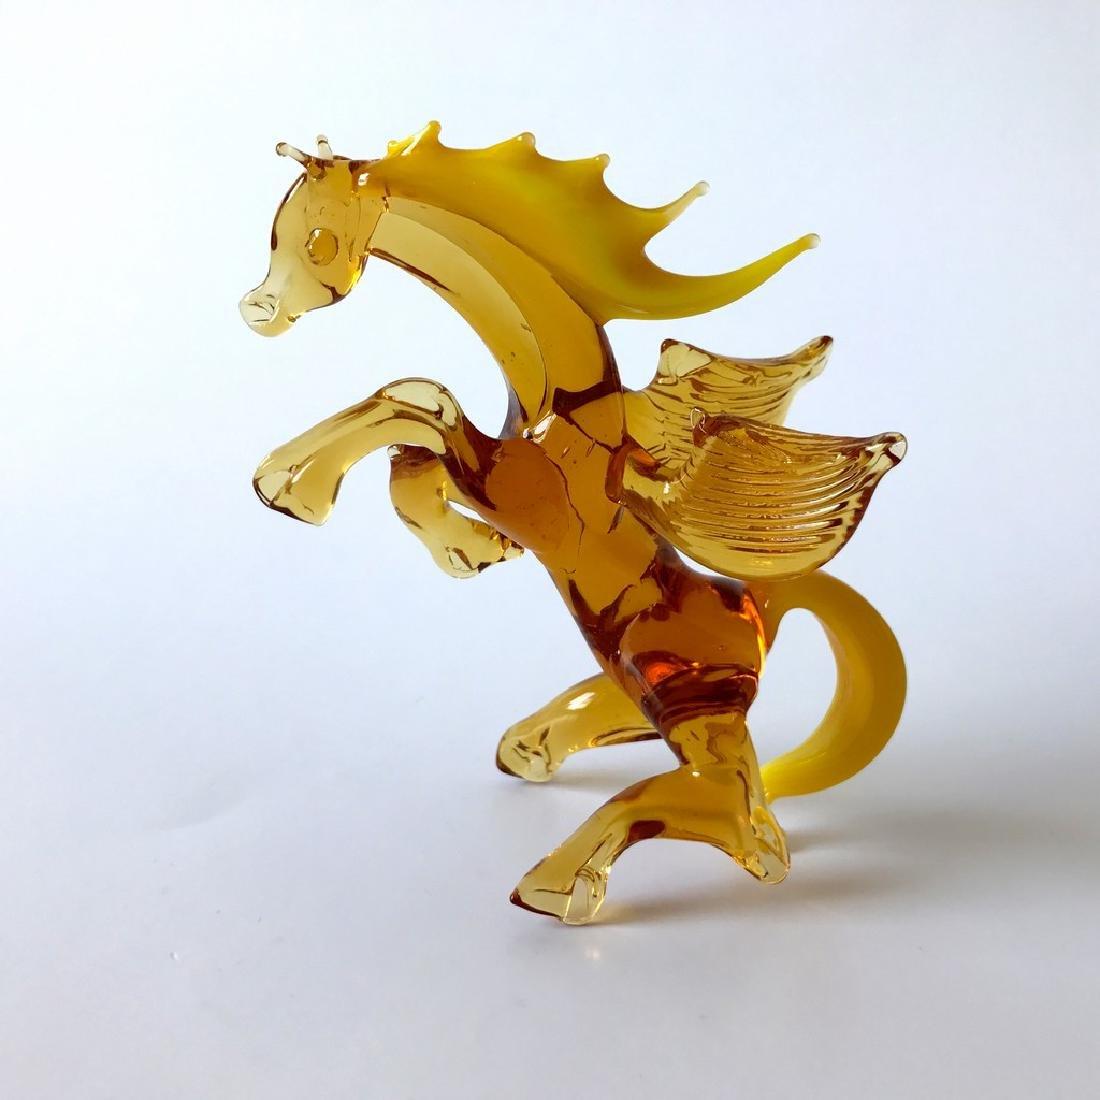 Figurine of Pegasus the winged horse amber coloured - 4